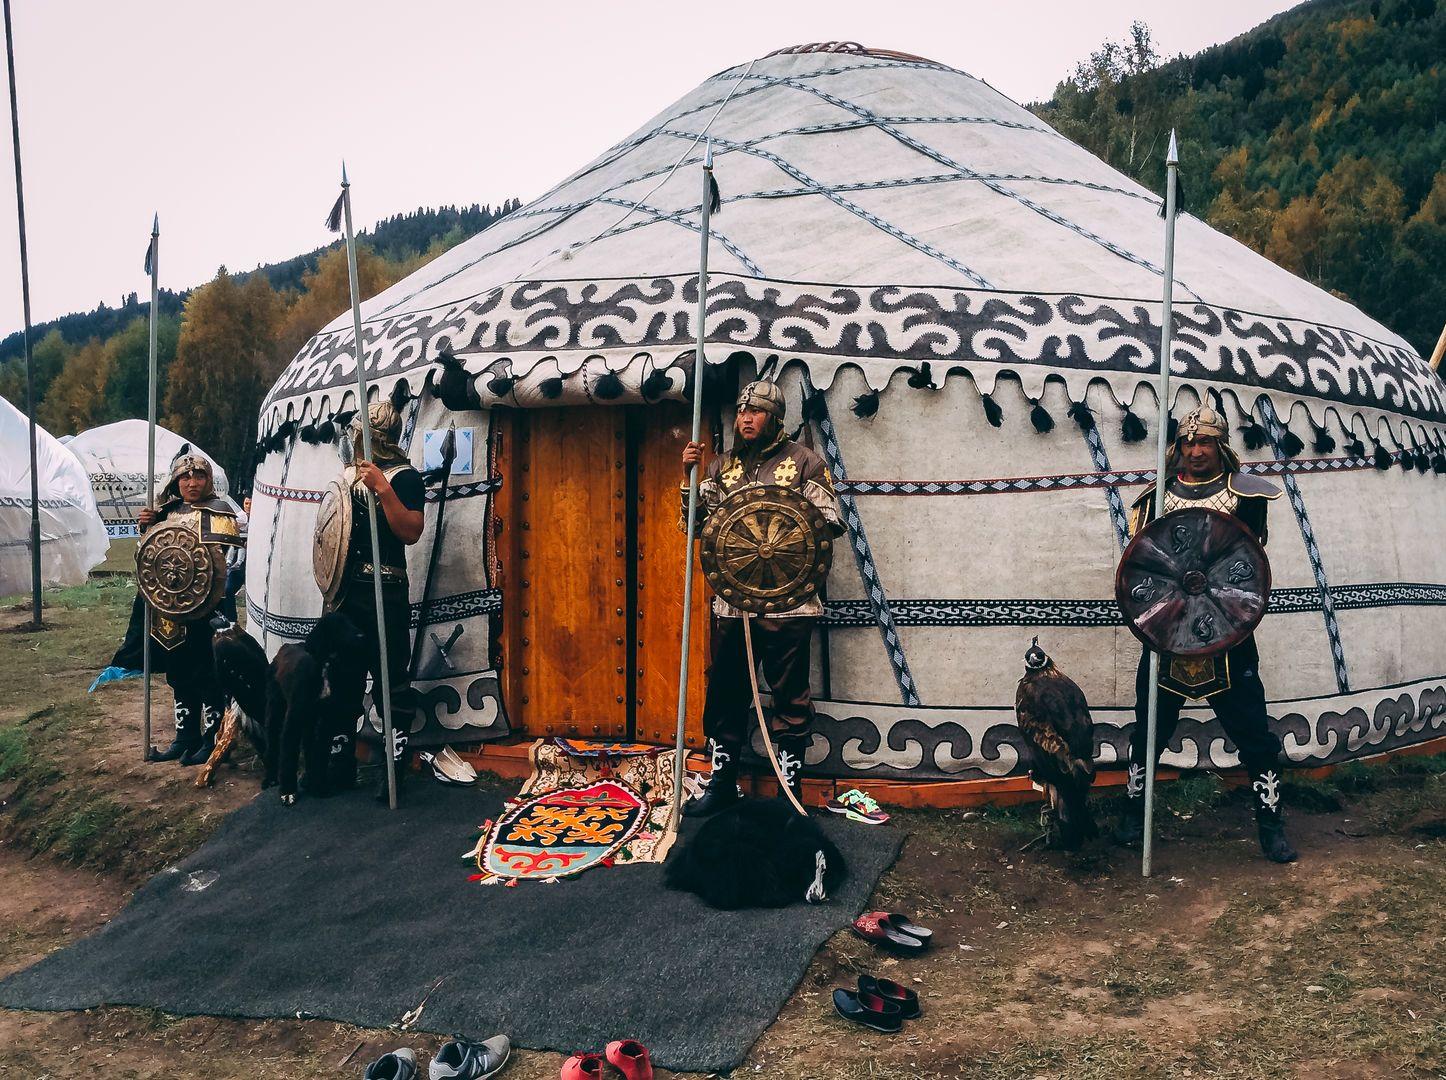 World nomad games yurt